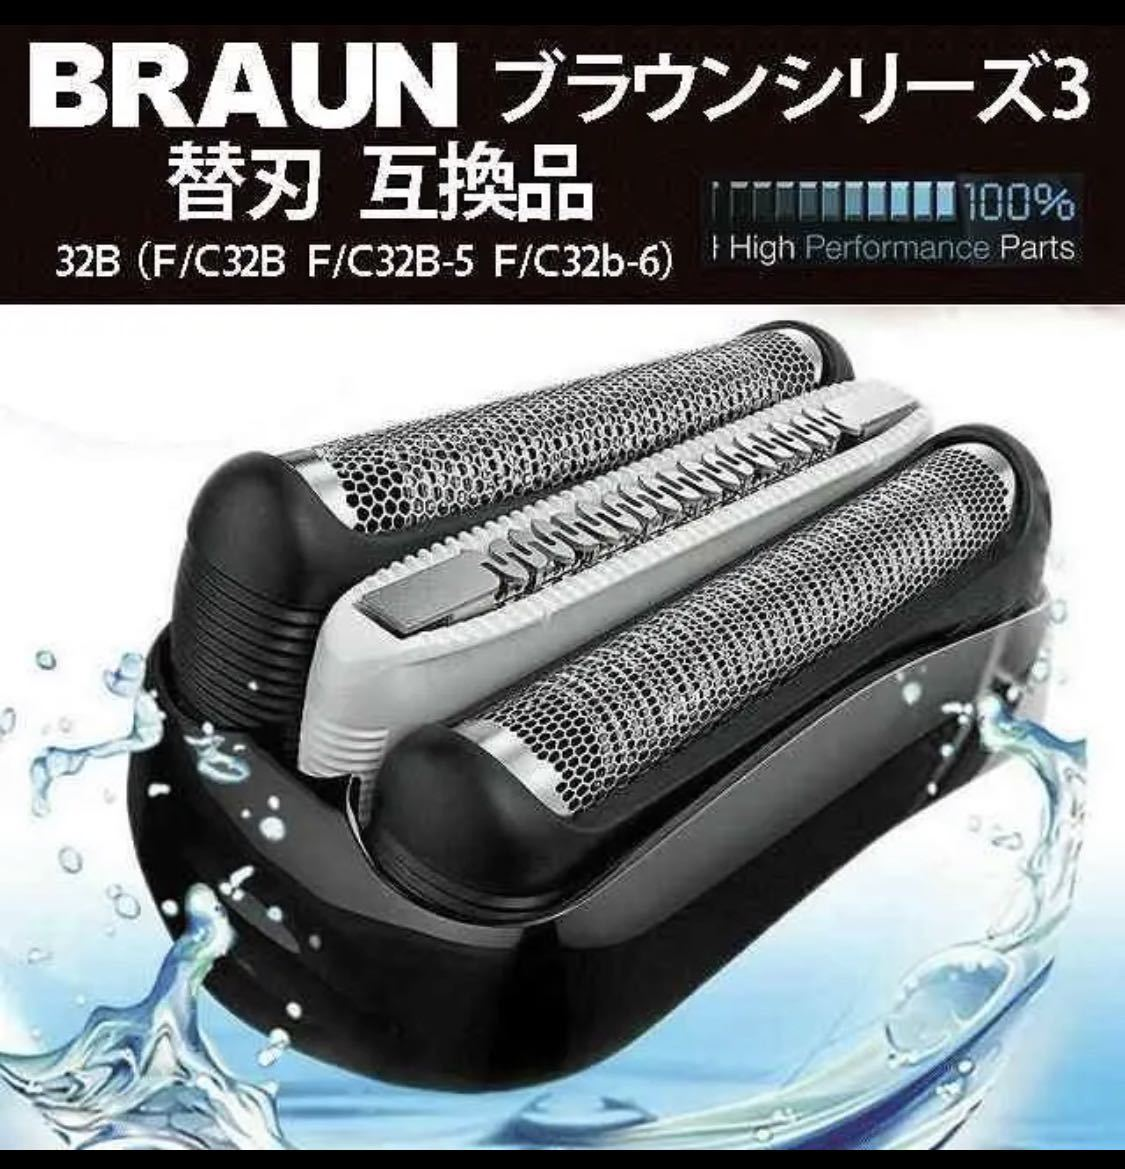 BRAUN ブラウン替刃 互換品 シリーズ332B 網刃 シェーバー 一体型